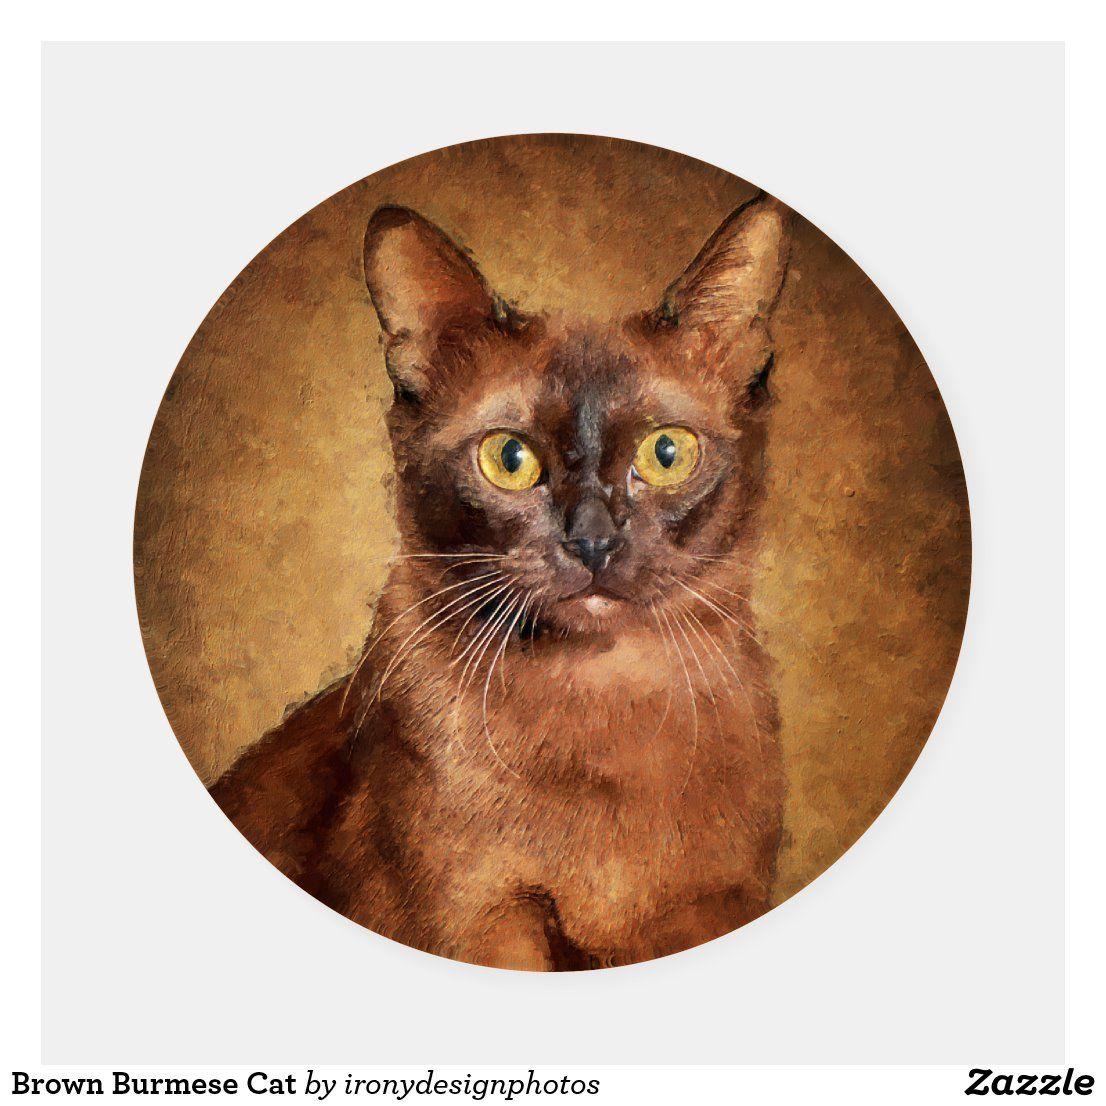 Brown Burmese Cat Coaster Set Zazzle Com In 2020 With Images Burmese Cat Cat Coasters Cat Art Painting